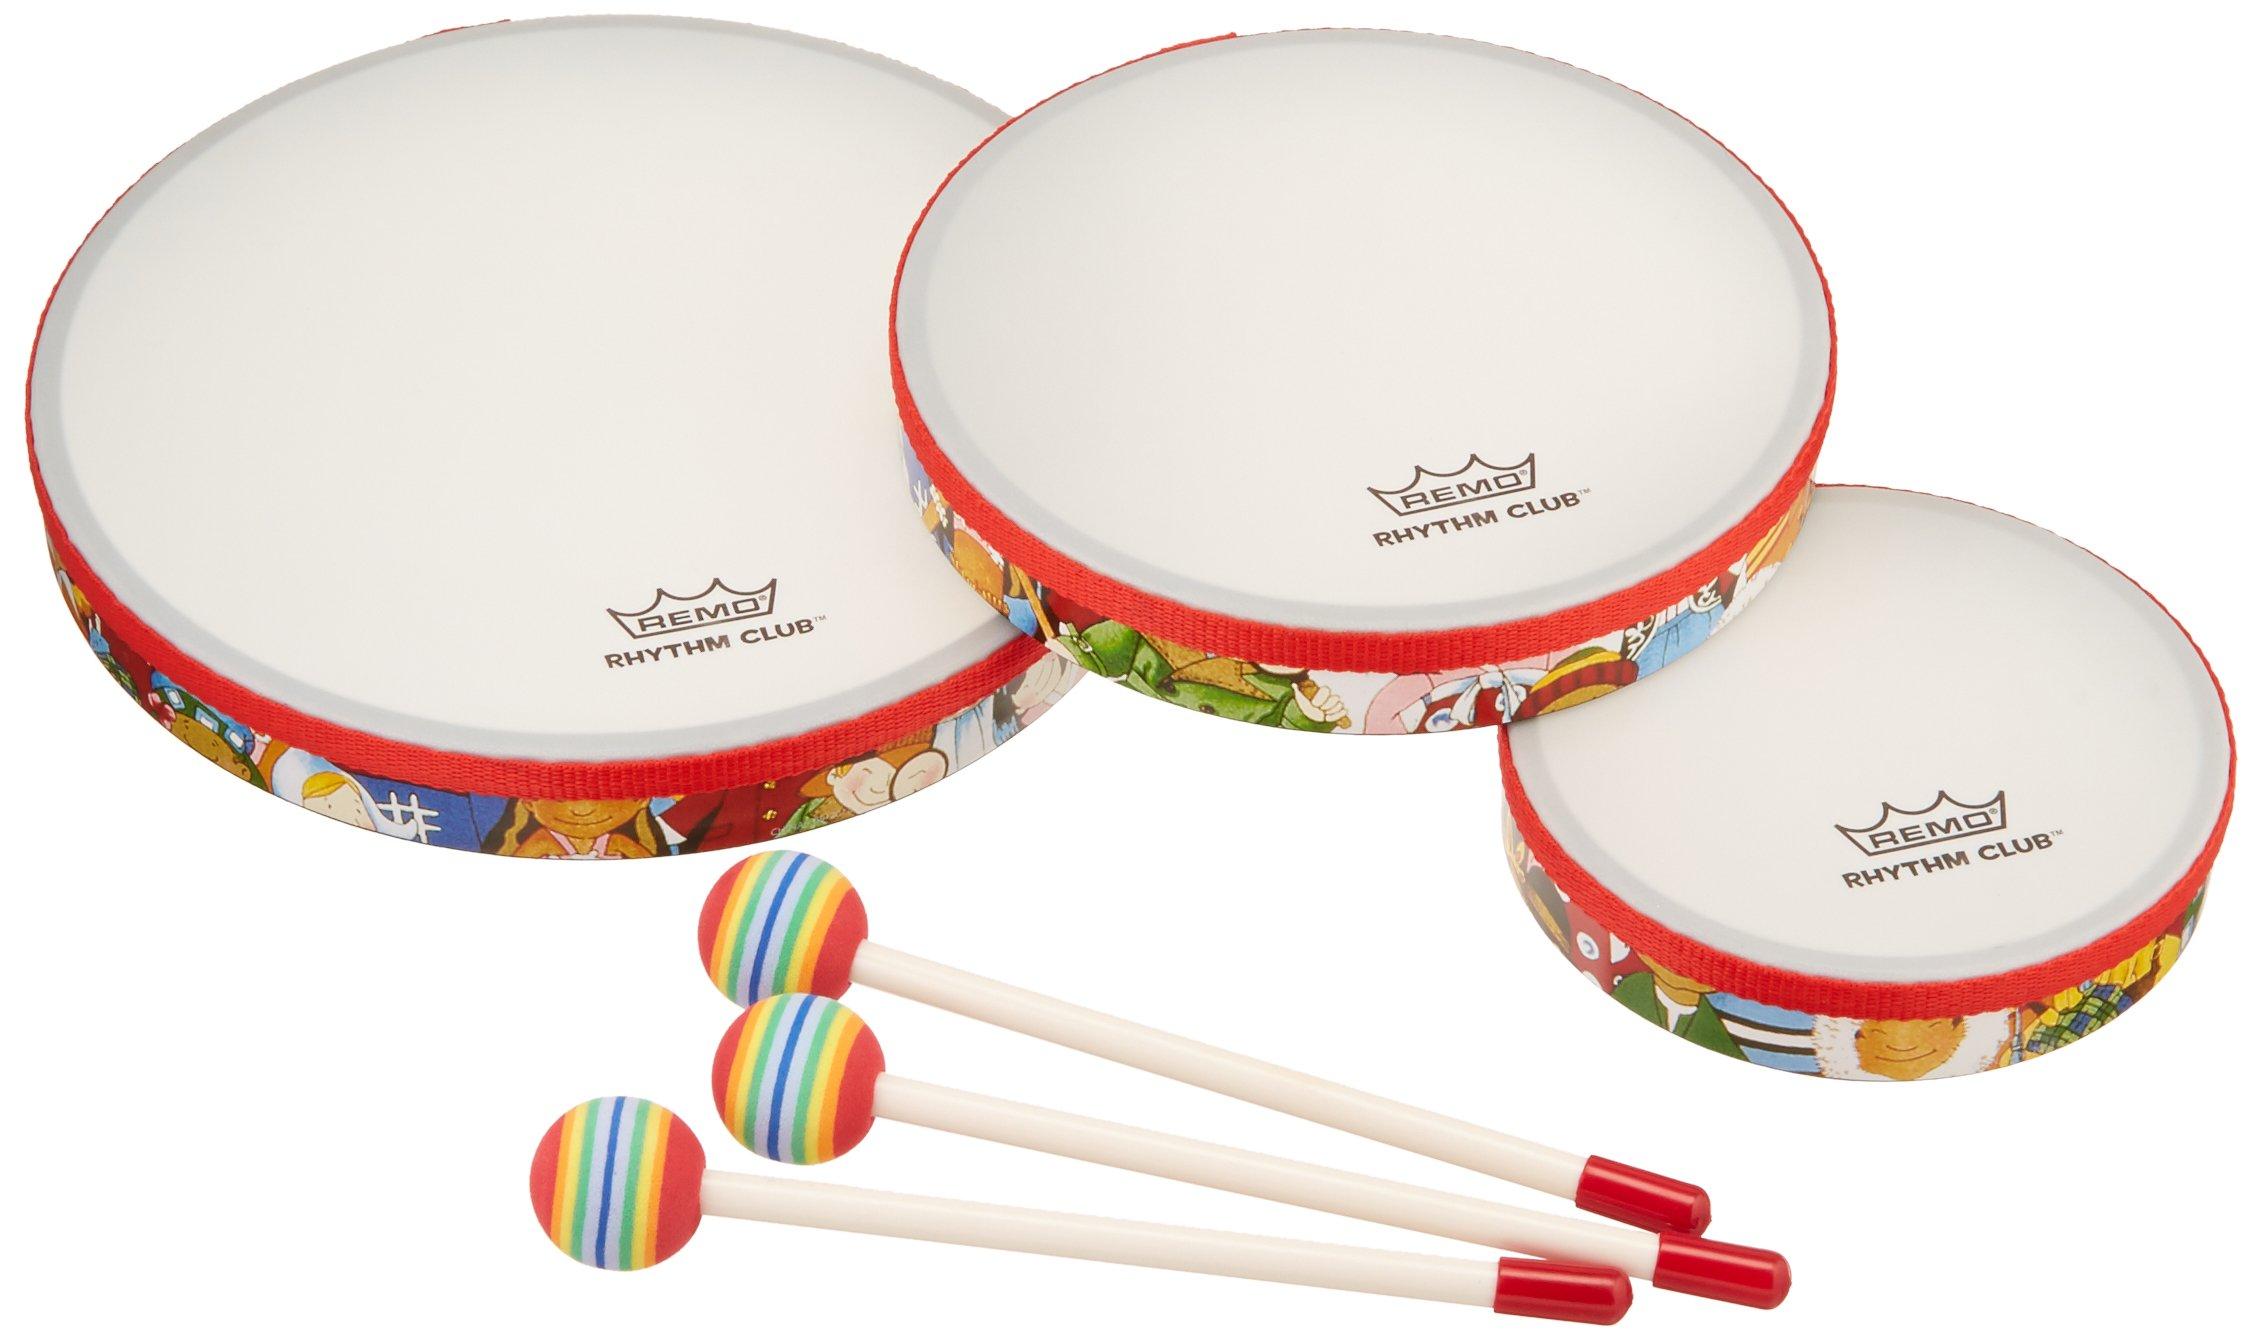 Remo RH3100-00 3-Piece Drum Set Multi-colored Rhythm Club Hand Drum Set, 6/8/10-Inch Diameters by Remo